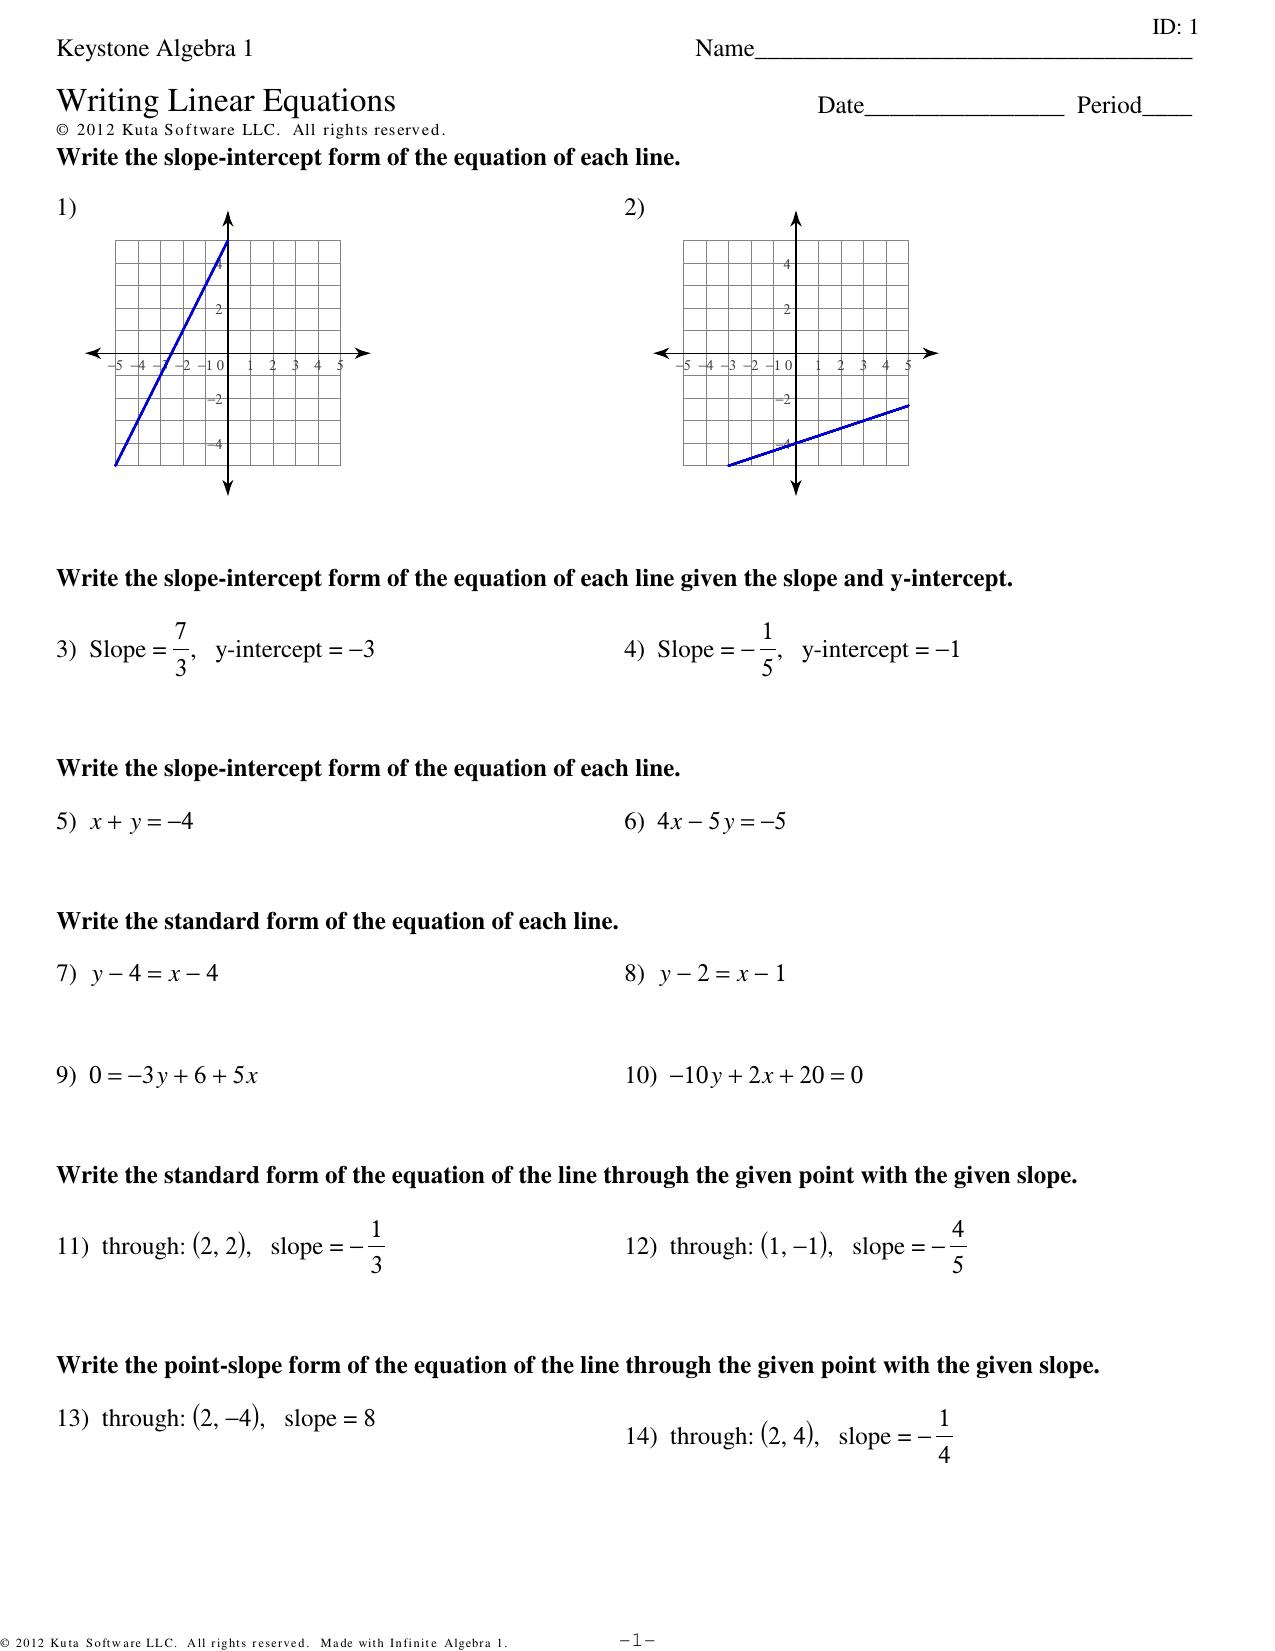 Keystone Algebra 1 Writing Linear Equations